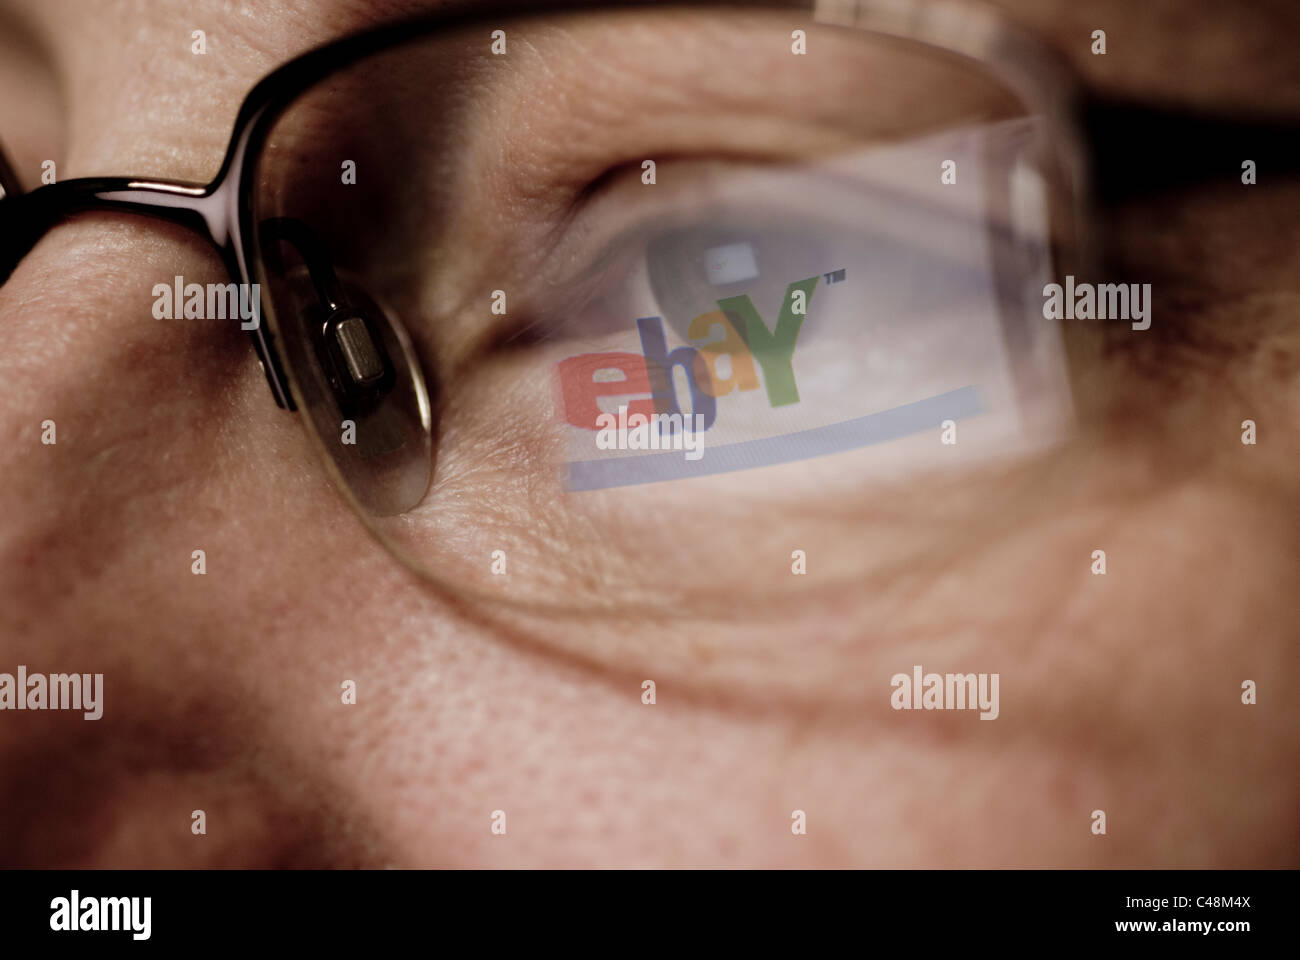 Ebay auction site logo reflected on glasses - Stock Image